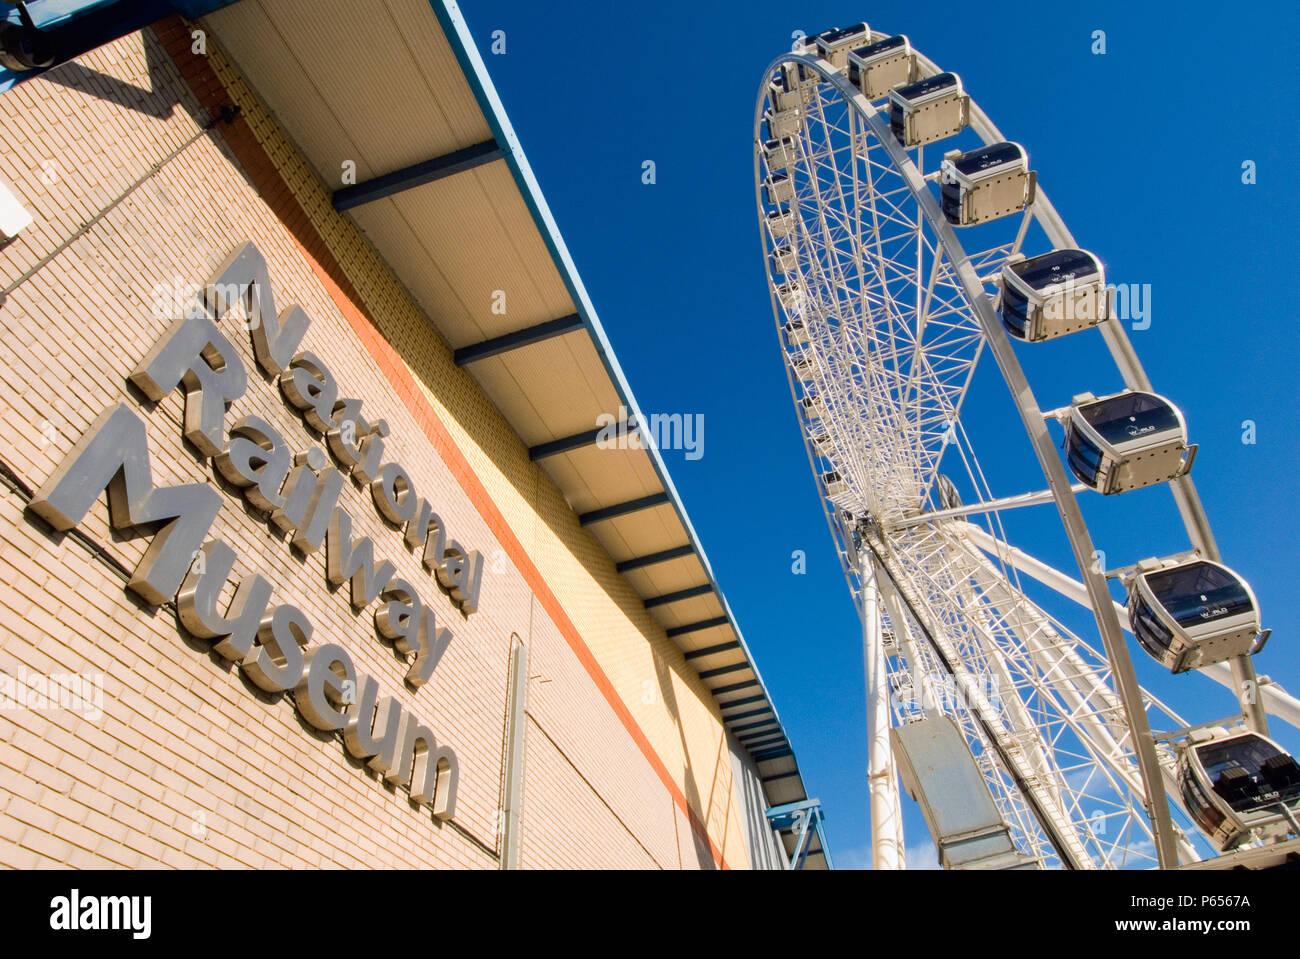 National Railway Museum and York wheel, York, United Kingdom - Stock Image